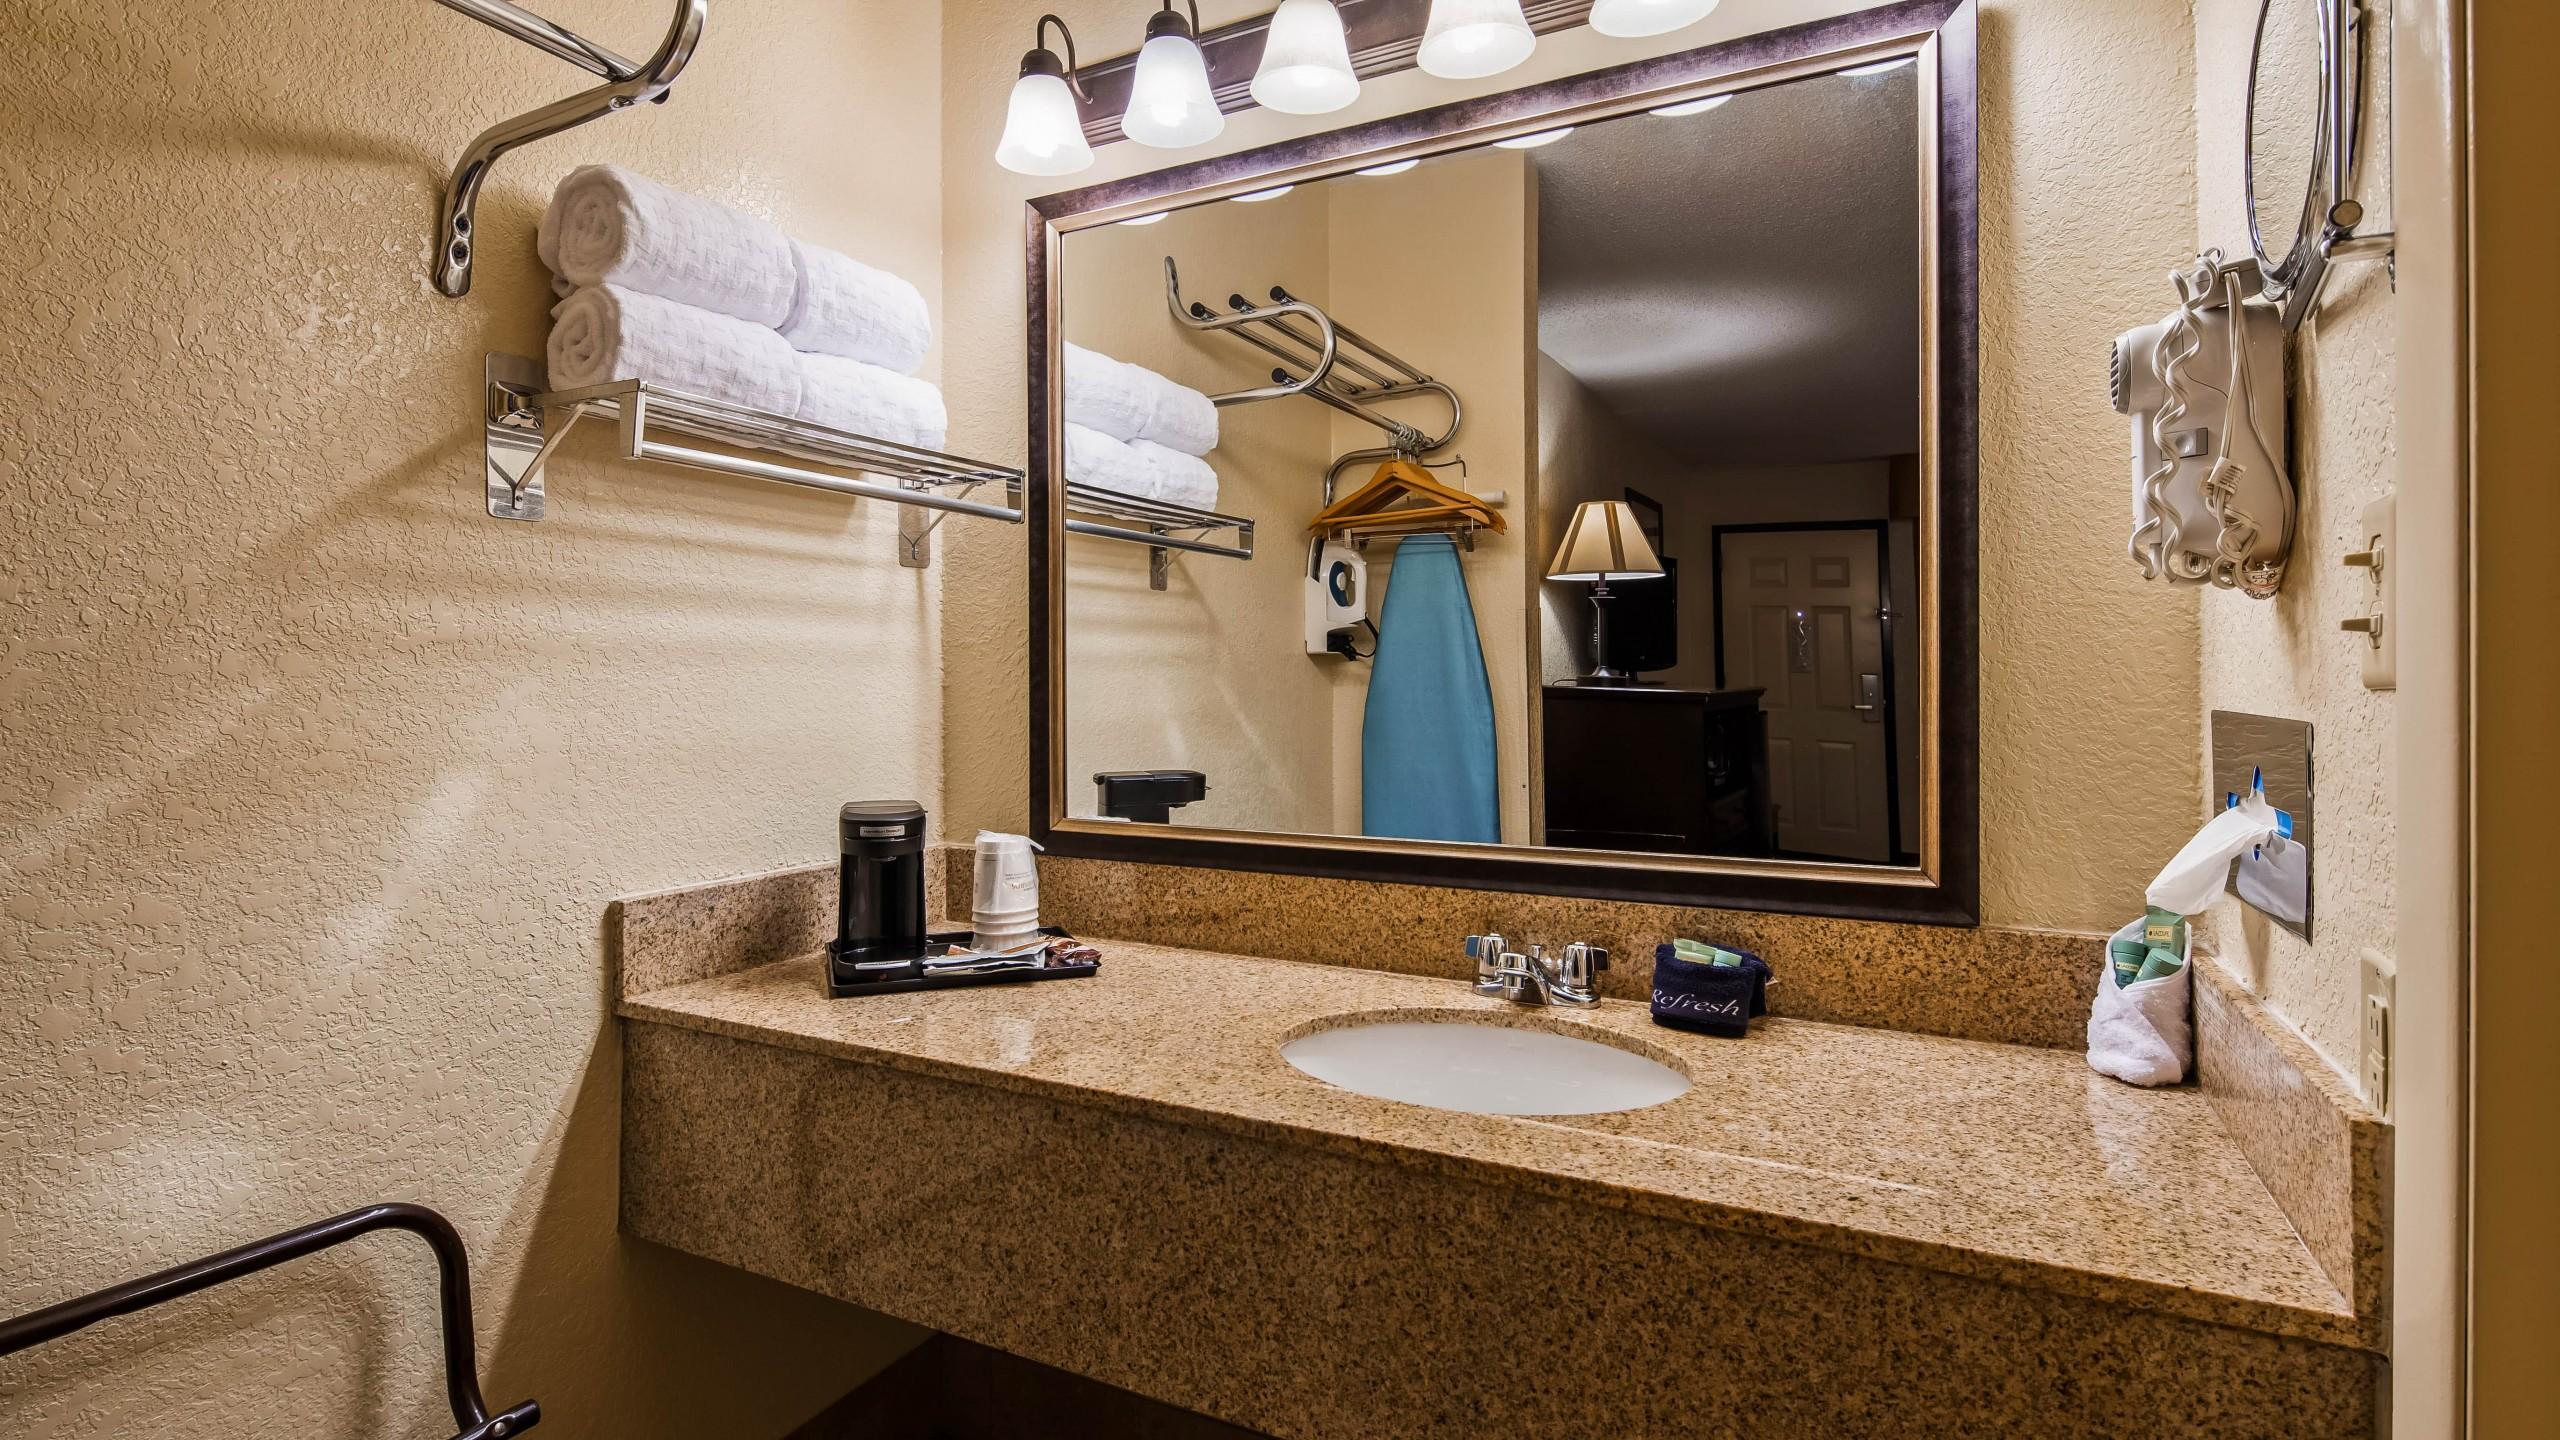 Best Western Center Pointe Inn King Bathroom Vanity